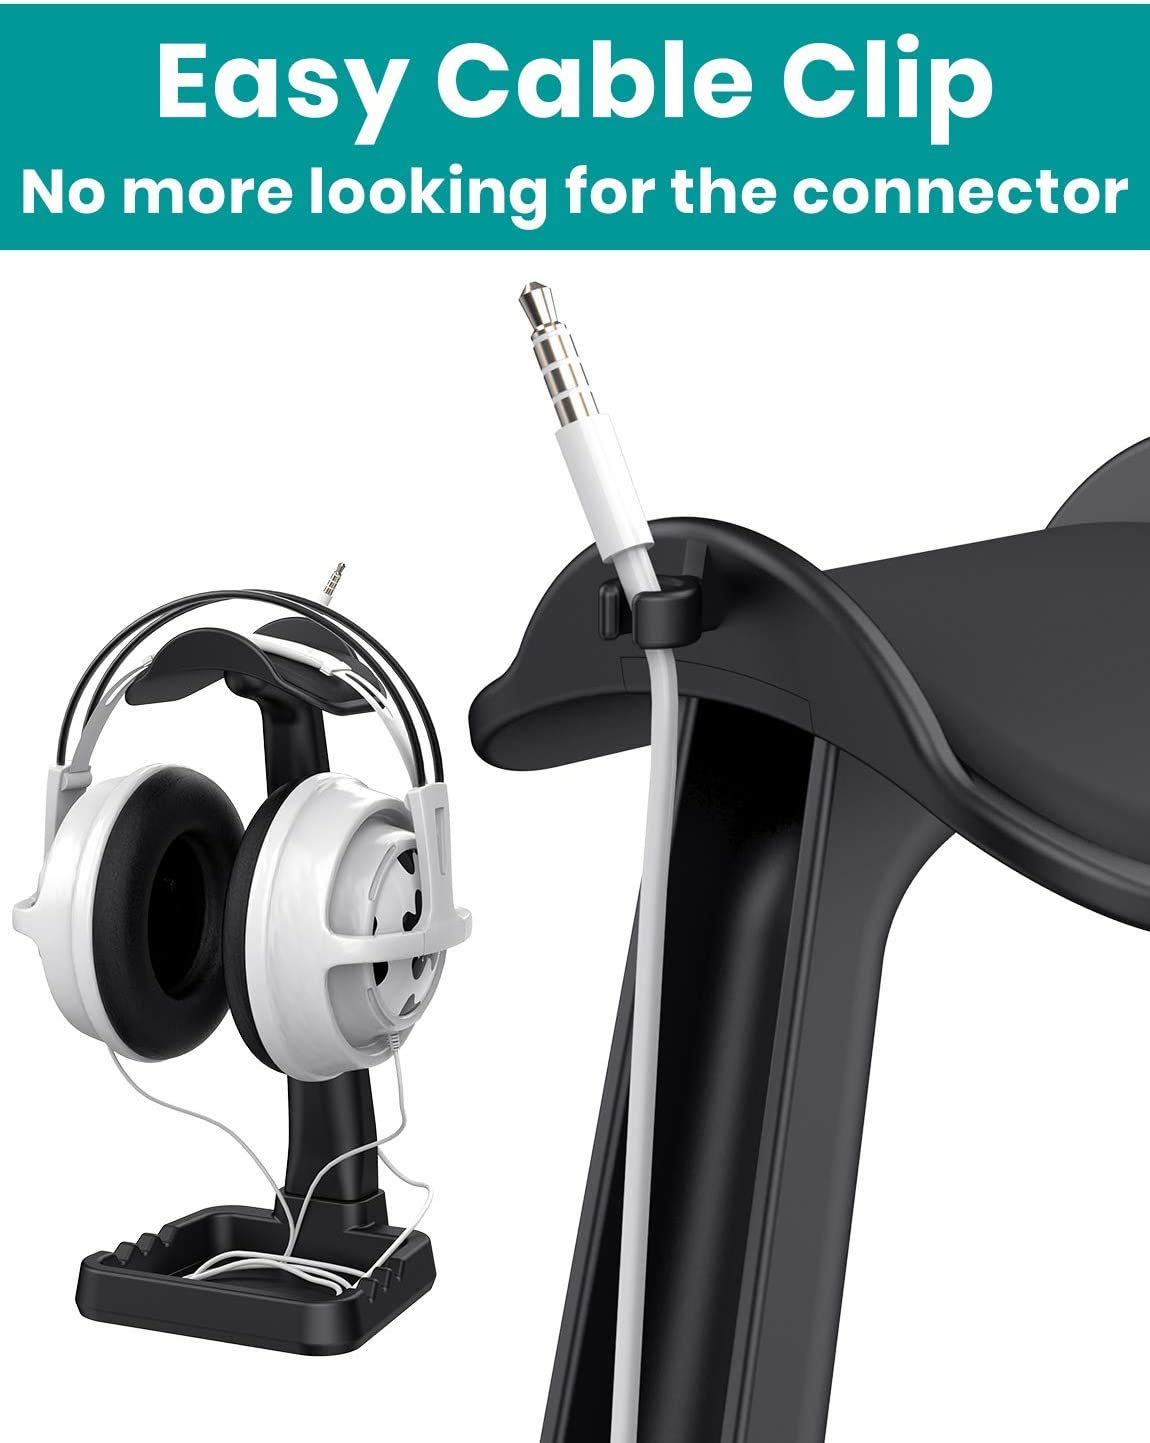 Headphone Stand Built in Cable Clip Organizer and Phone Holder, Klearlook (High stability/Multi-Purpose) Universal Headset Mount Hanger Gaming Headset Rack Desktop Organization Earphone Display-Black